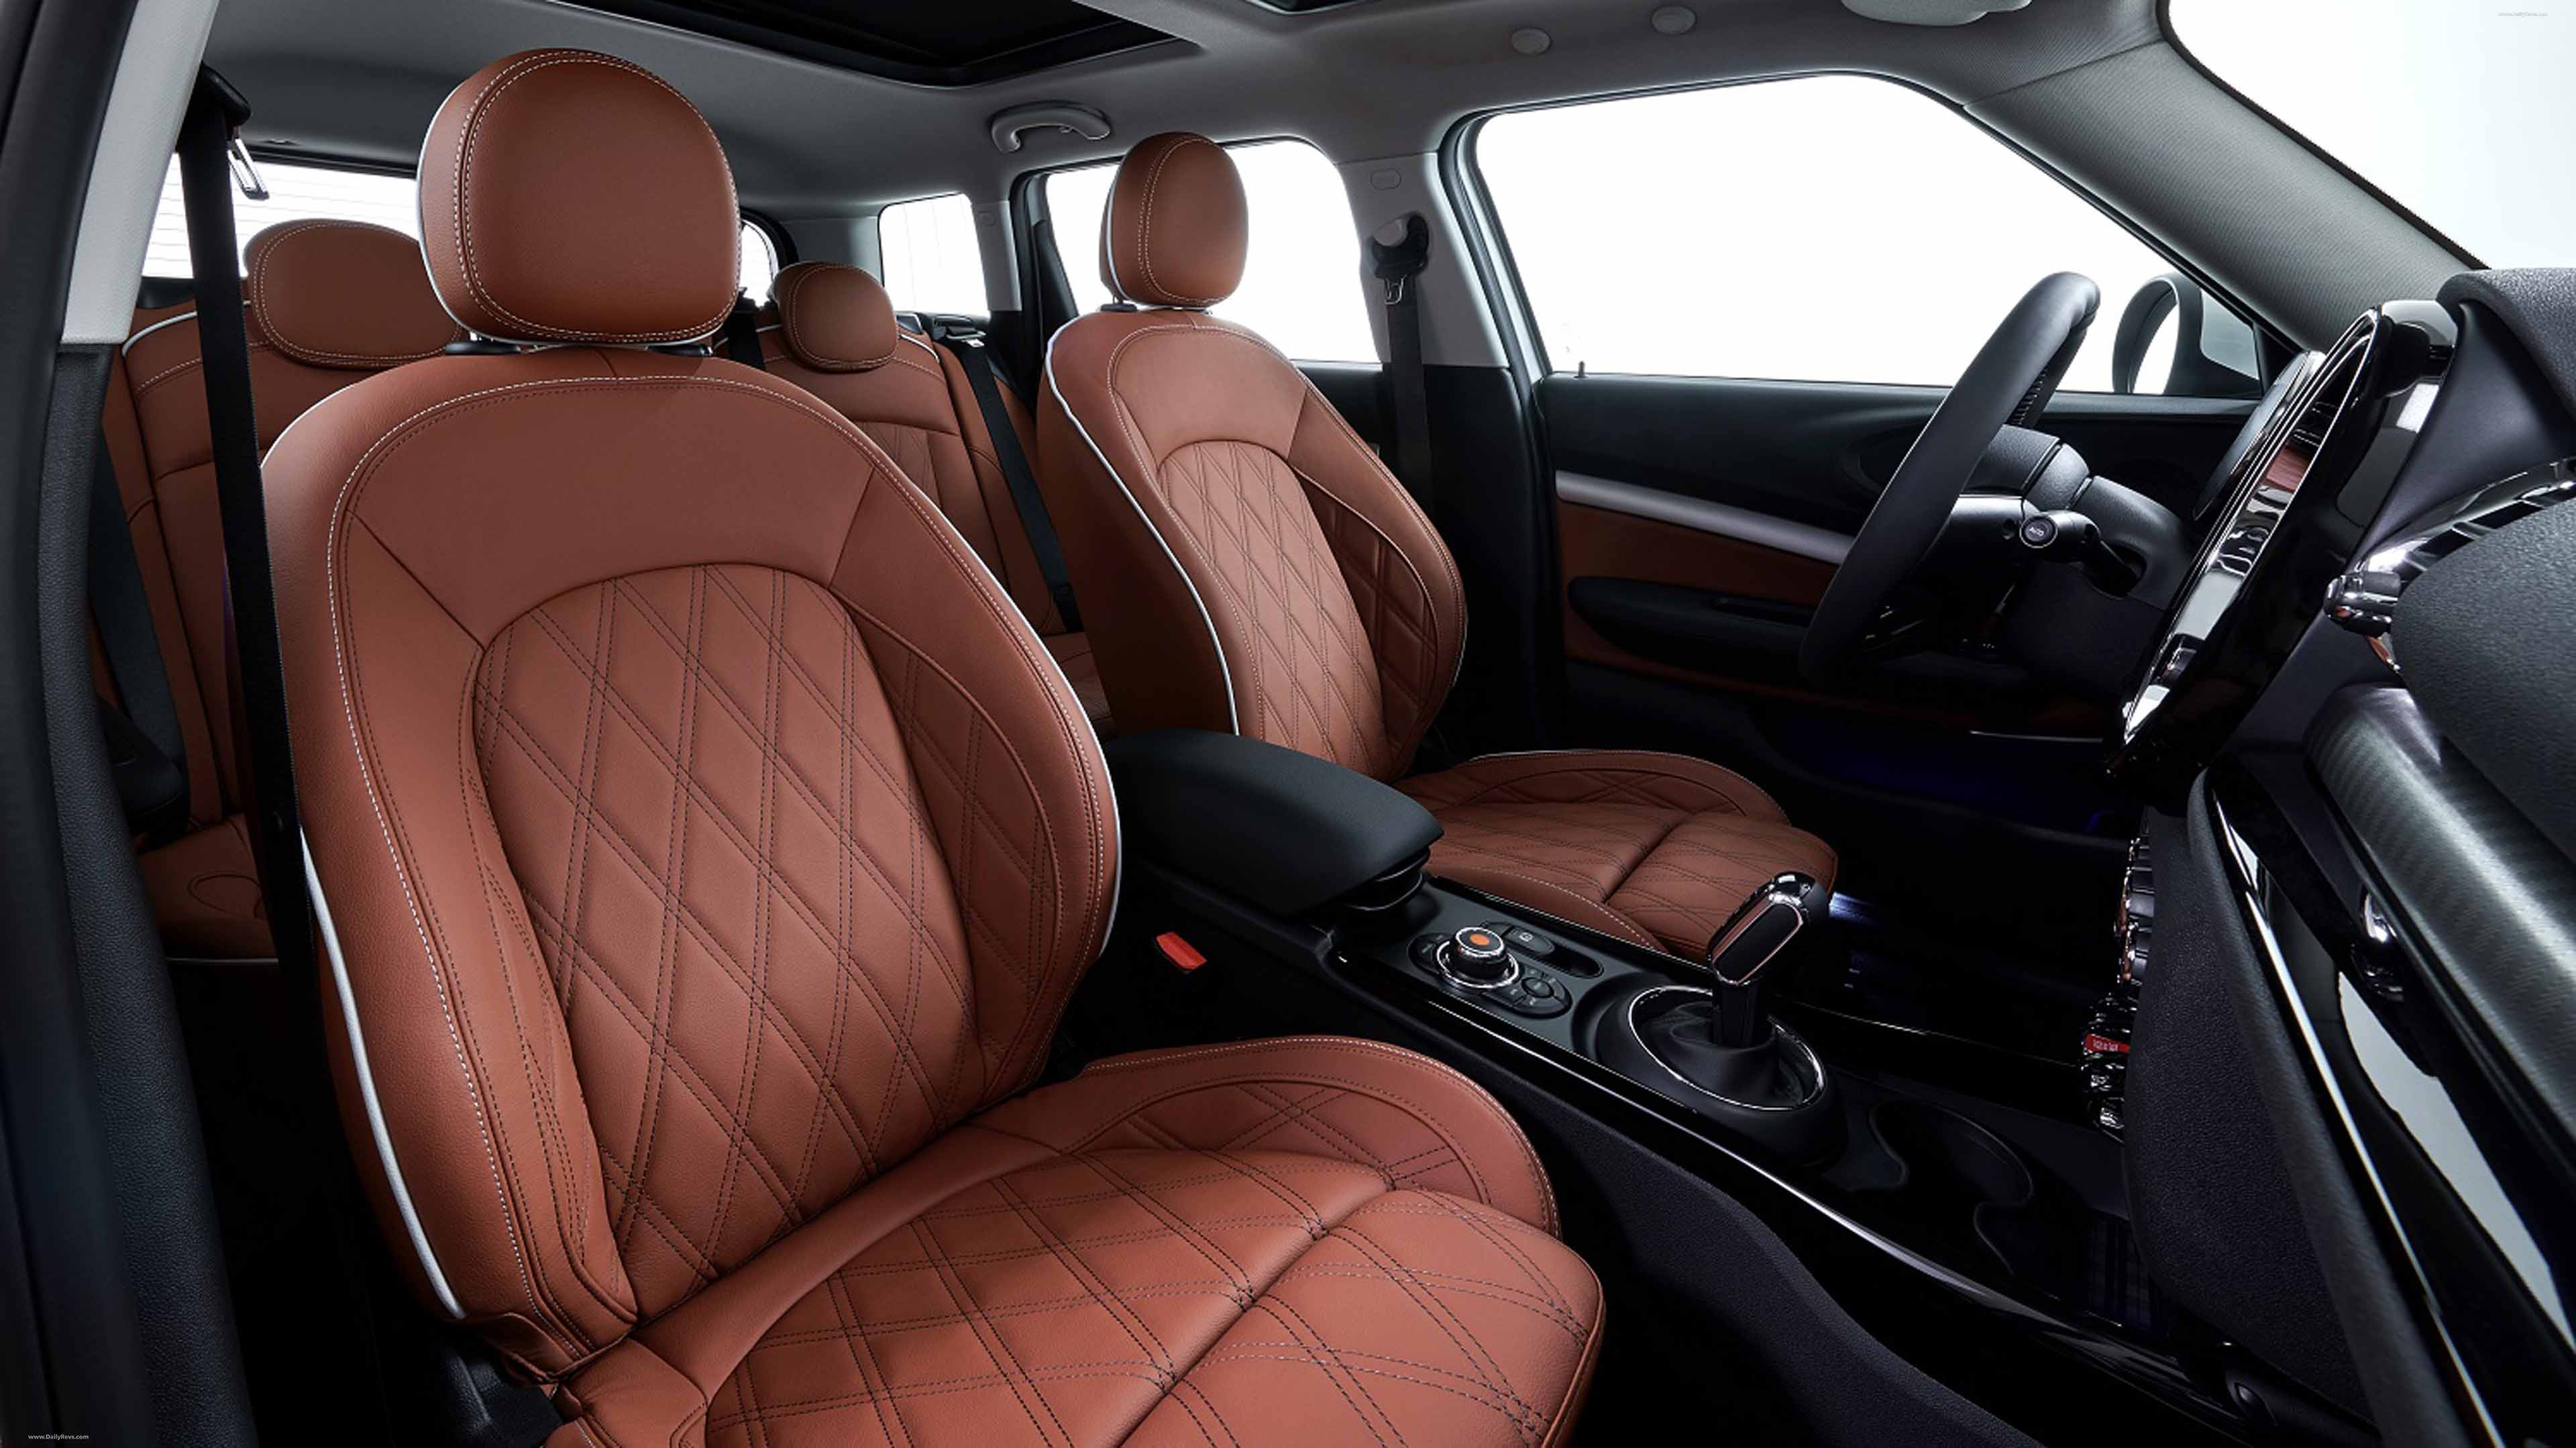 2021 MINI Cooper Clubman Islington Edition full